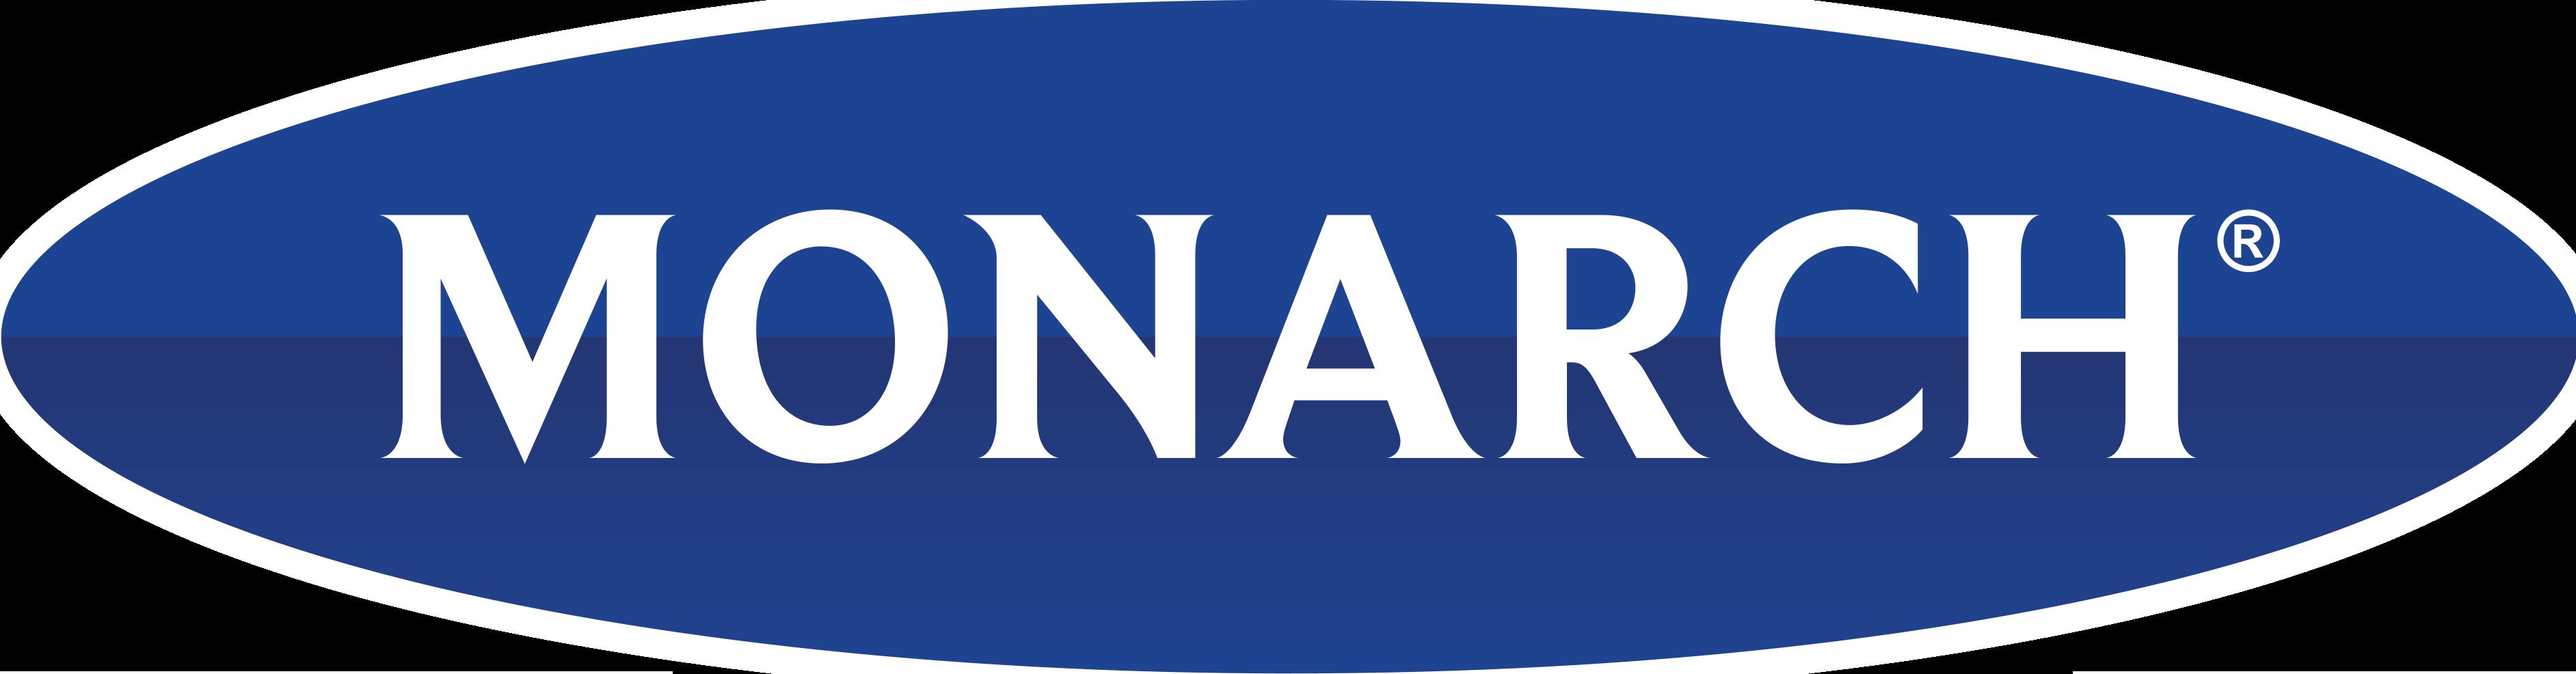 Logo - Monarch - Main PCM